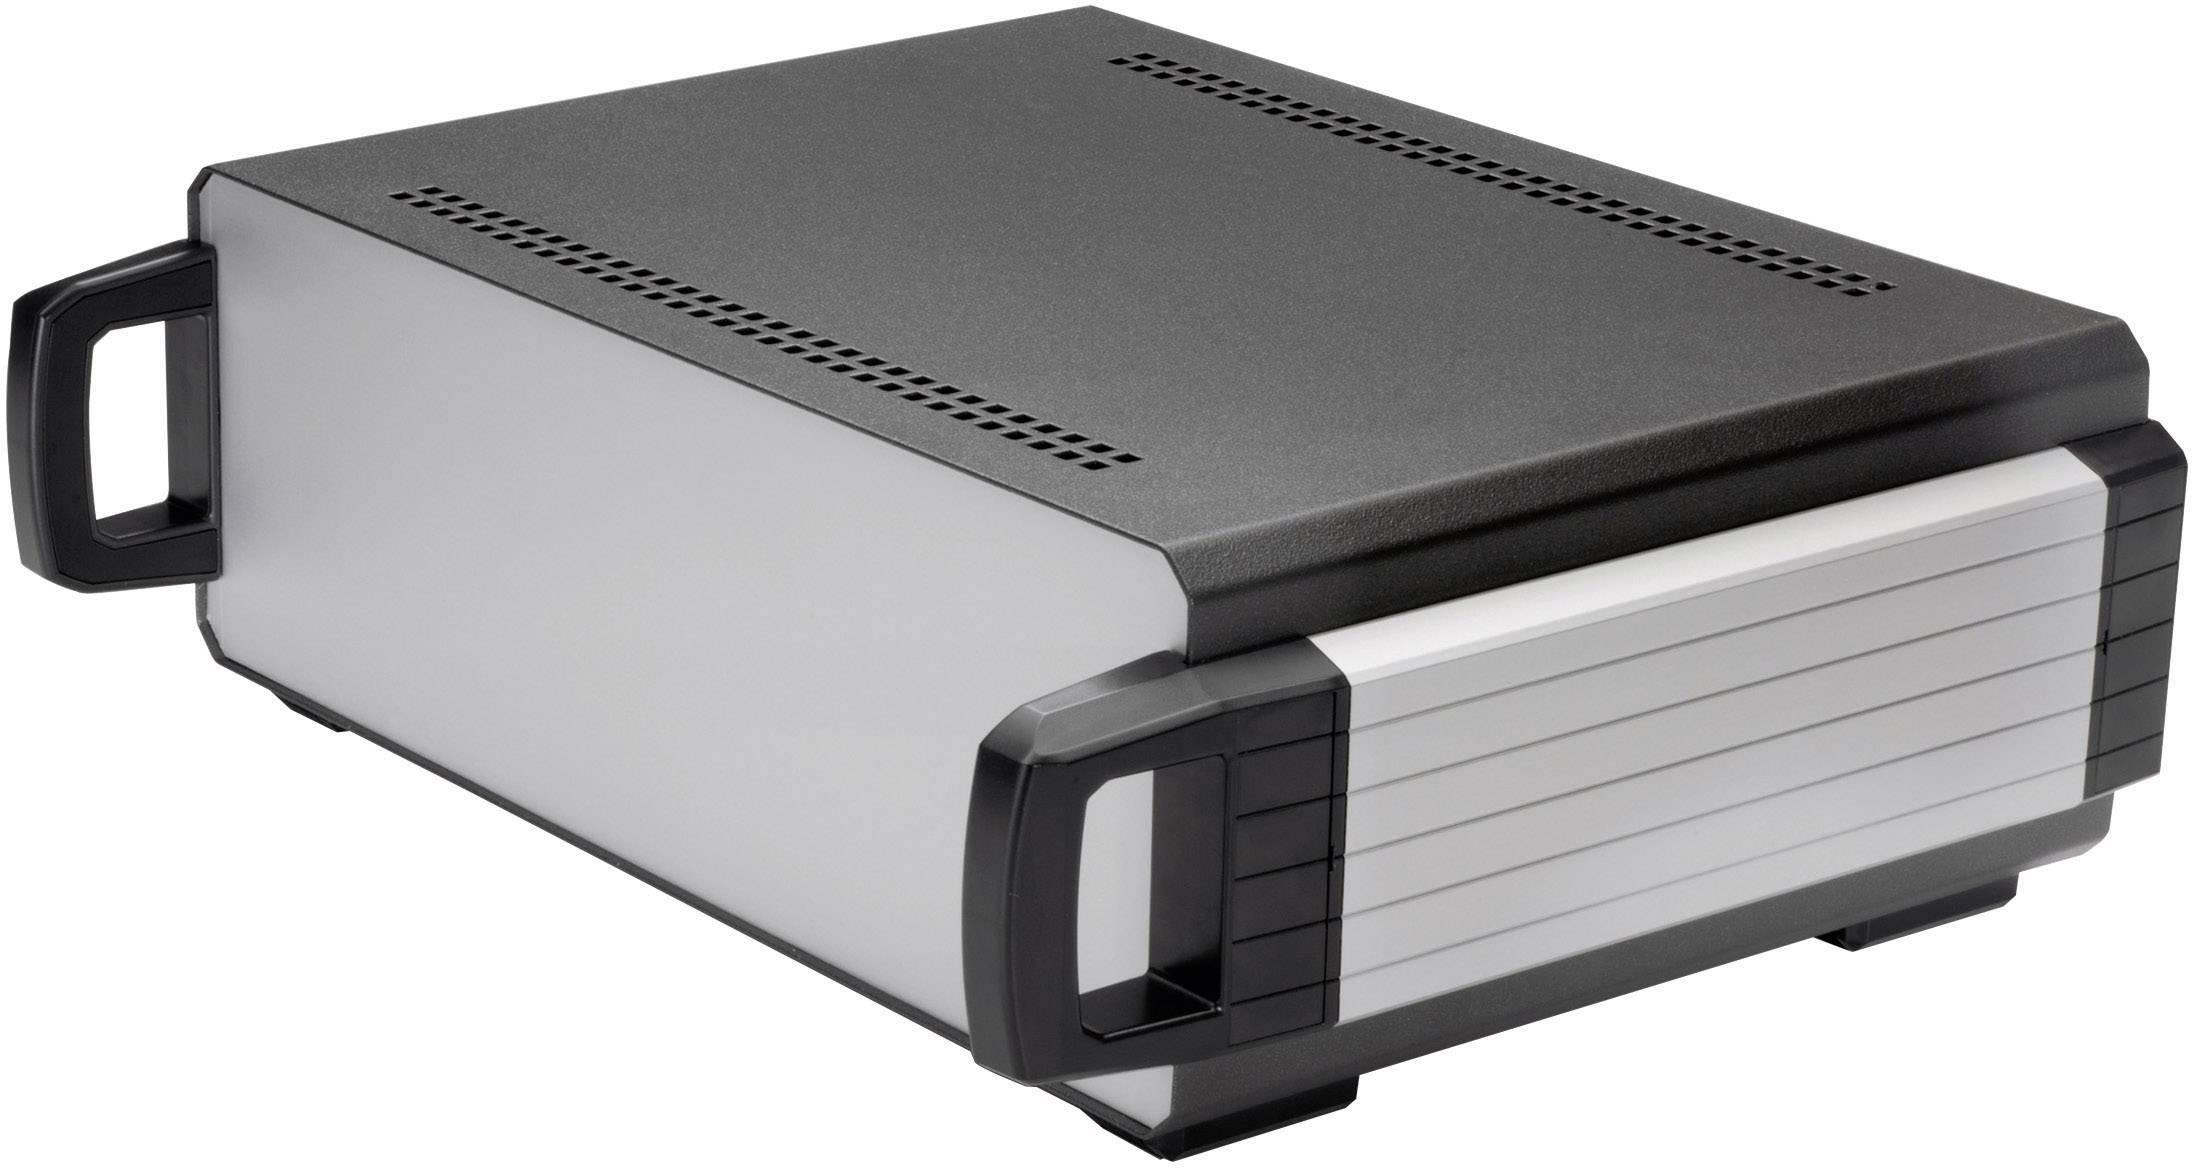 Stolní pouzdro hliníkové Axxatronic 31110005-CON, (d x š x v) 300 x 220 x 100 mm, antracitov